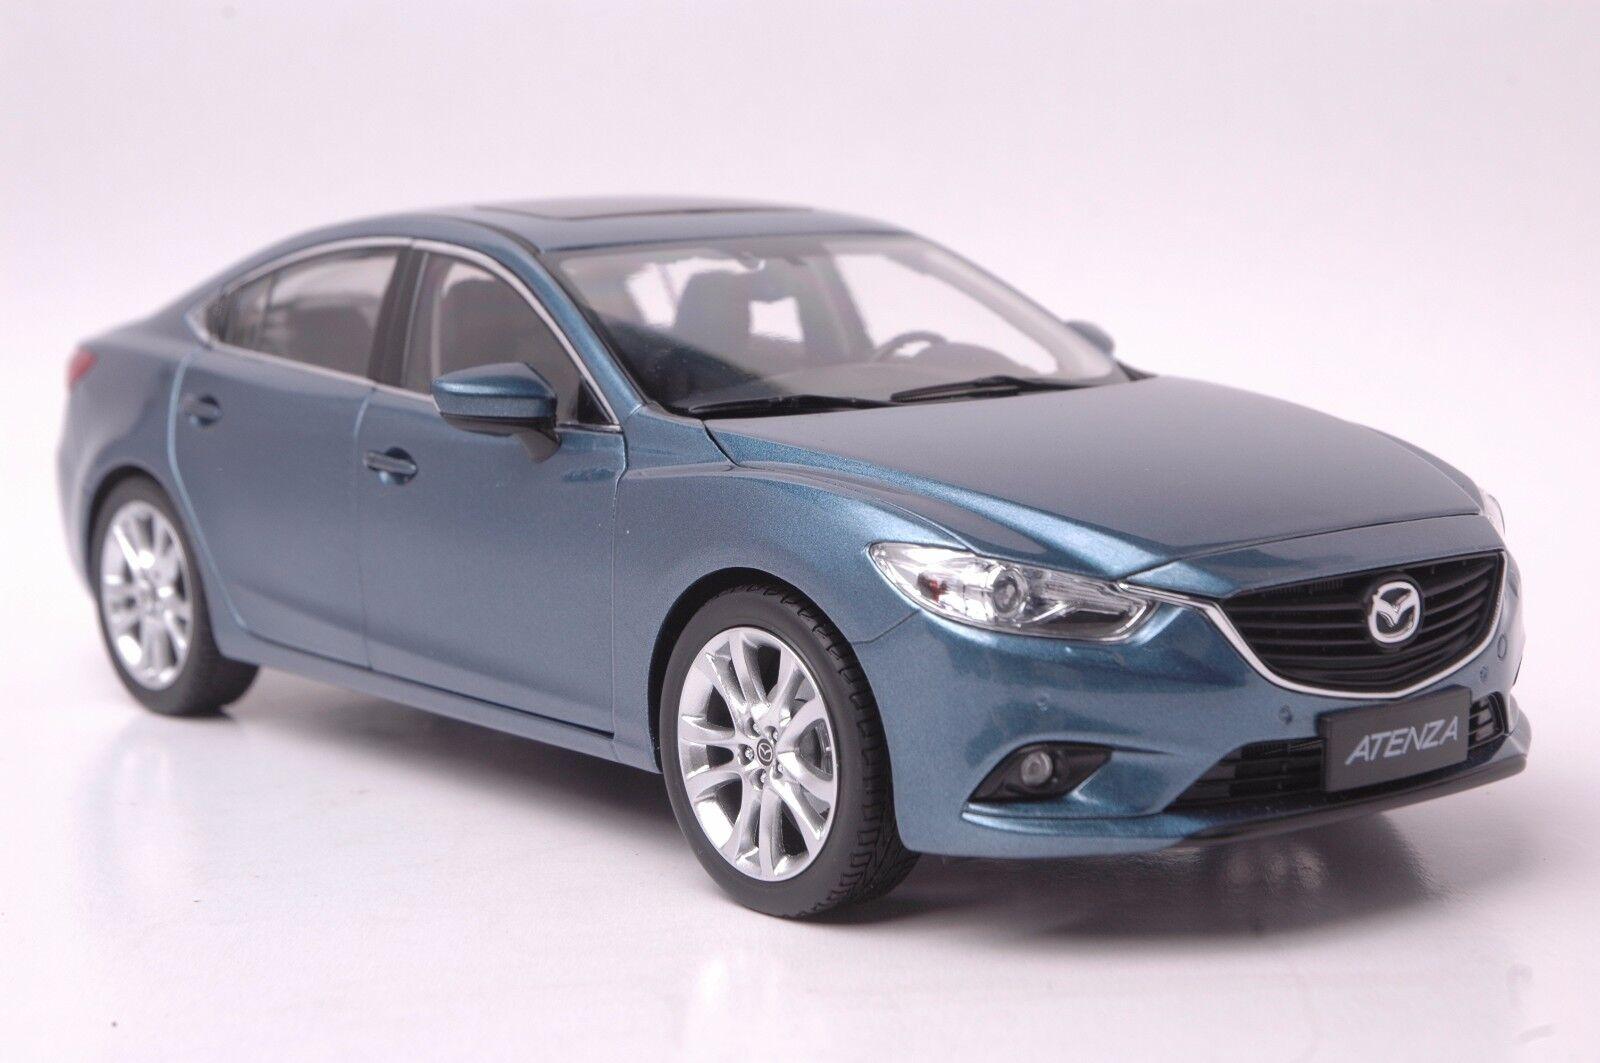 Mazda Atenza car model in scale 1 18 bluee